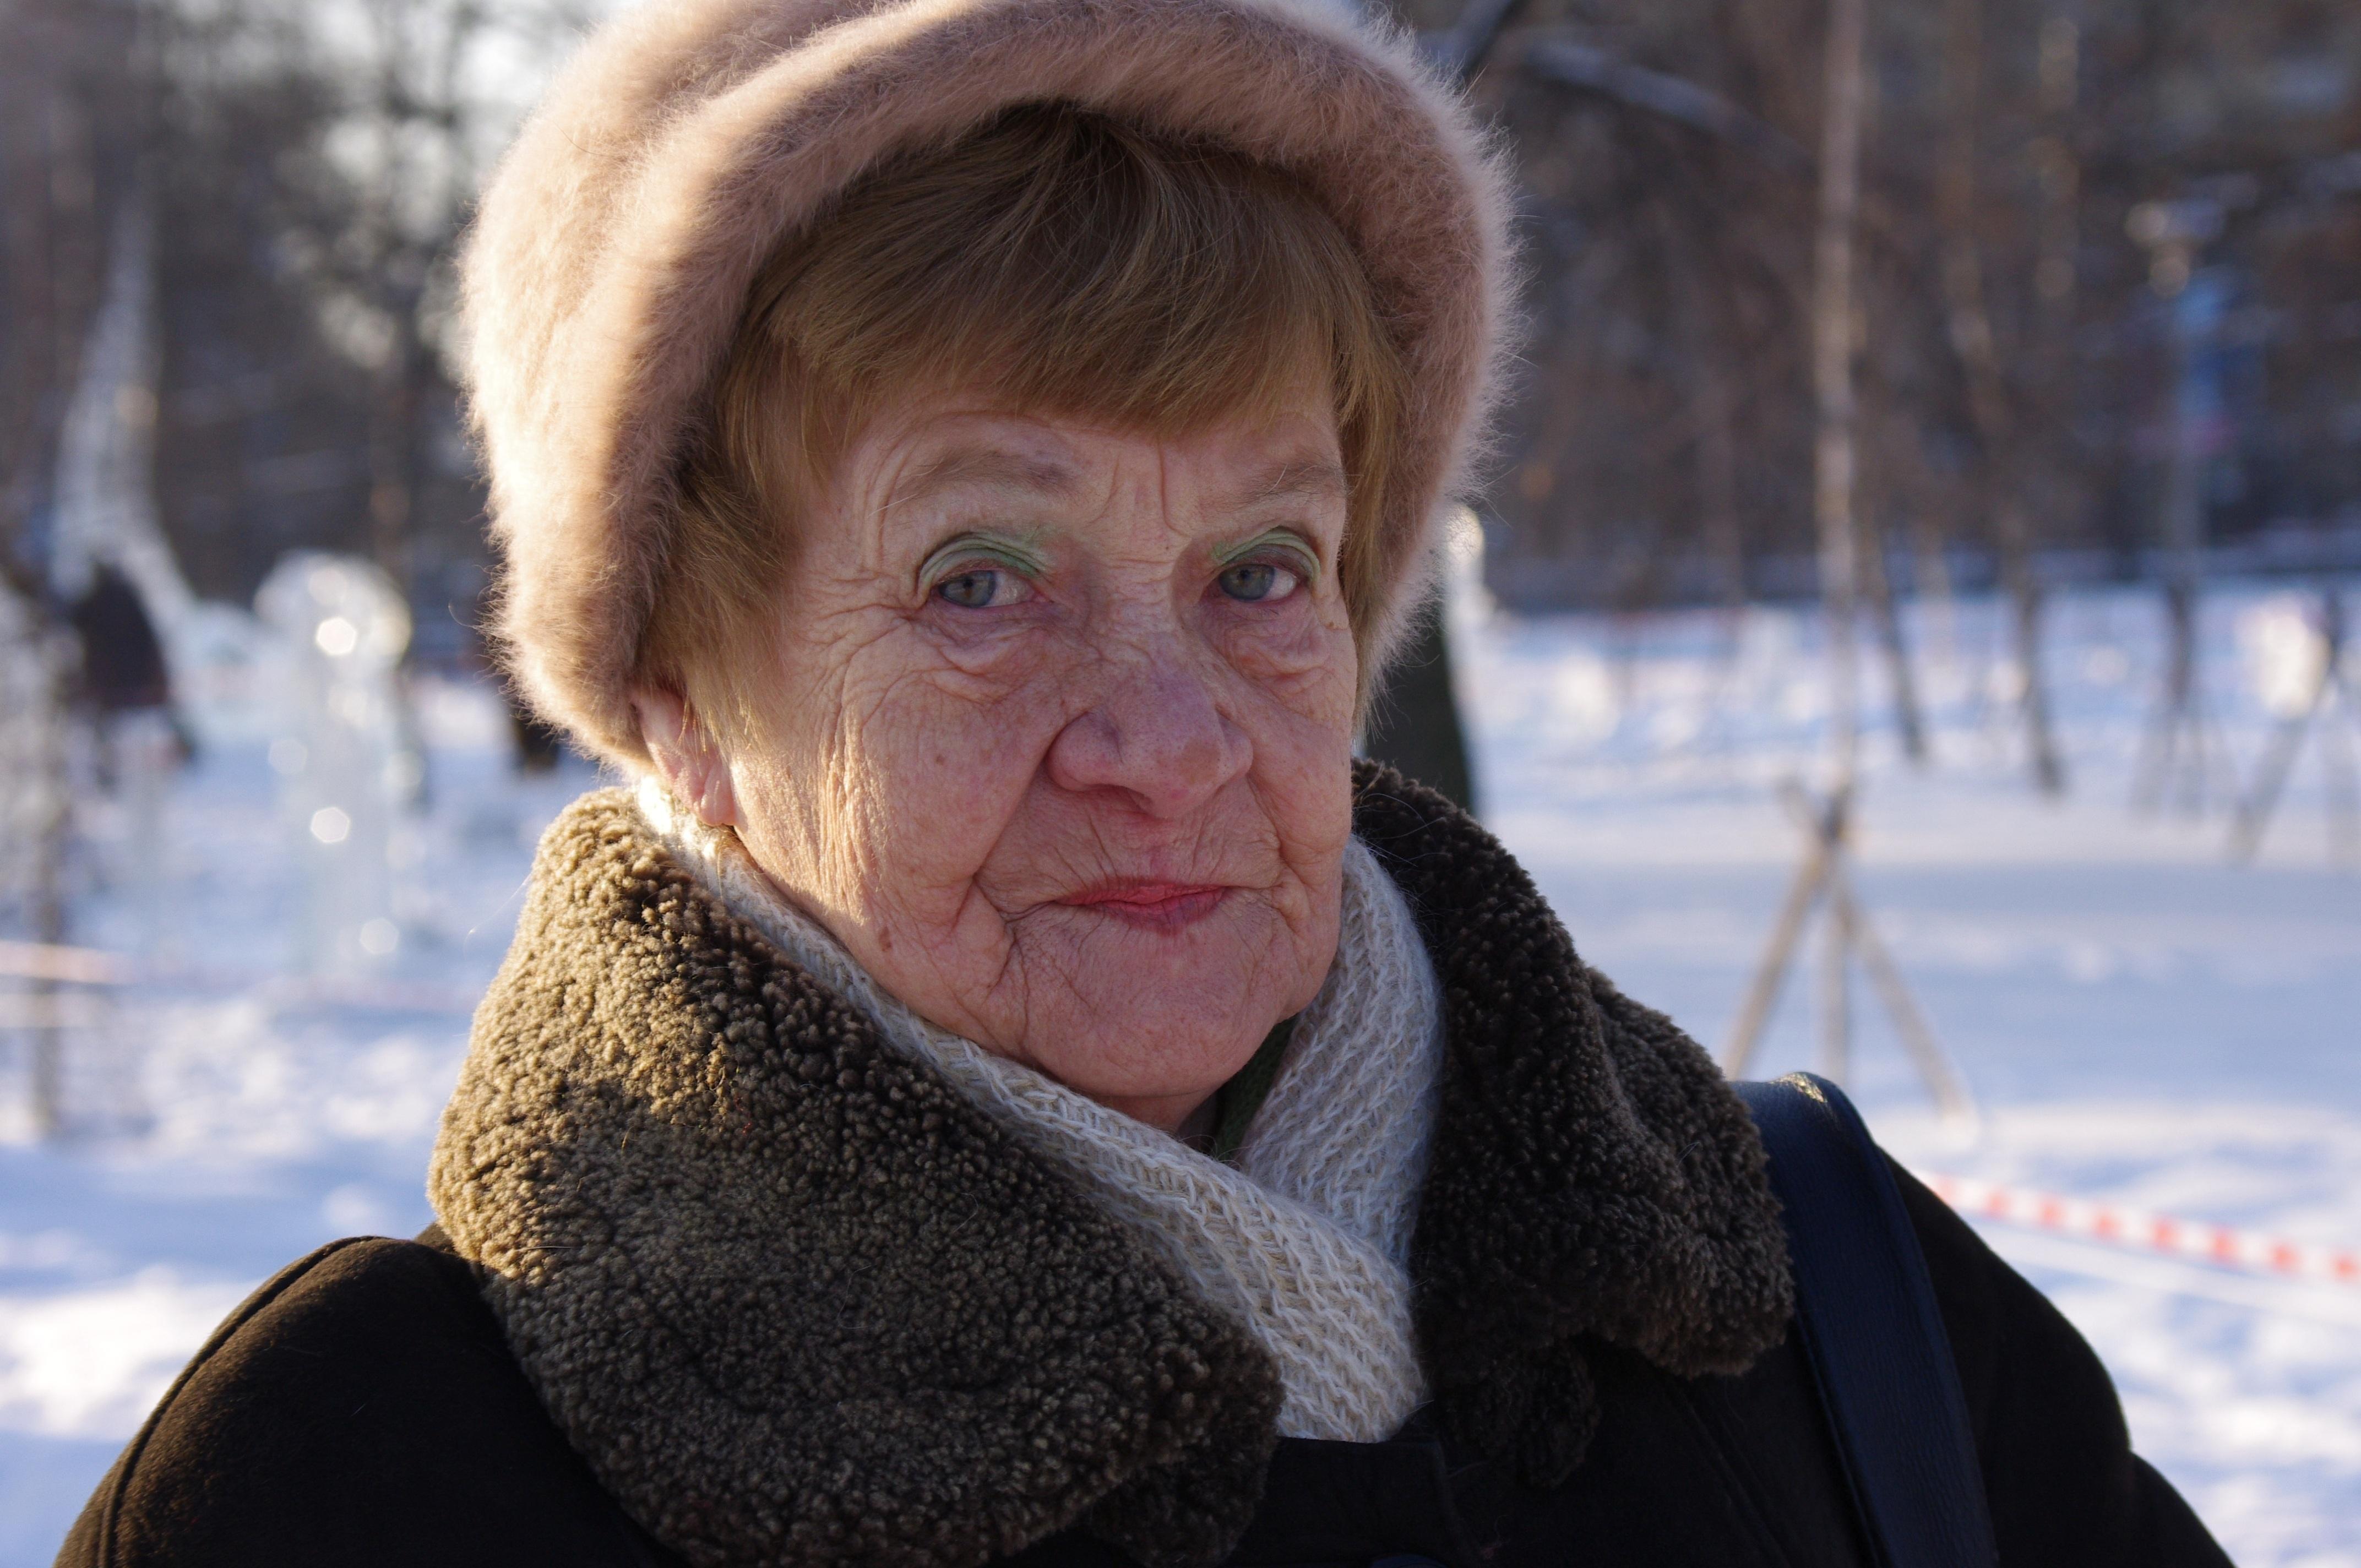 Grandma pensioners free image